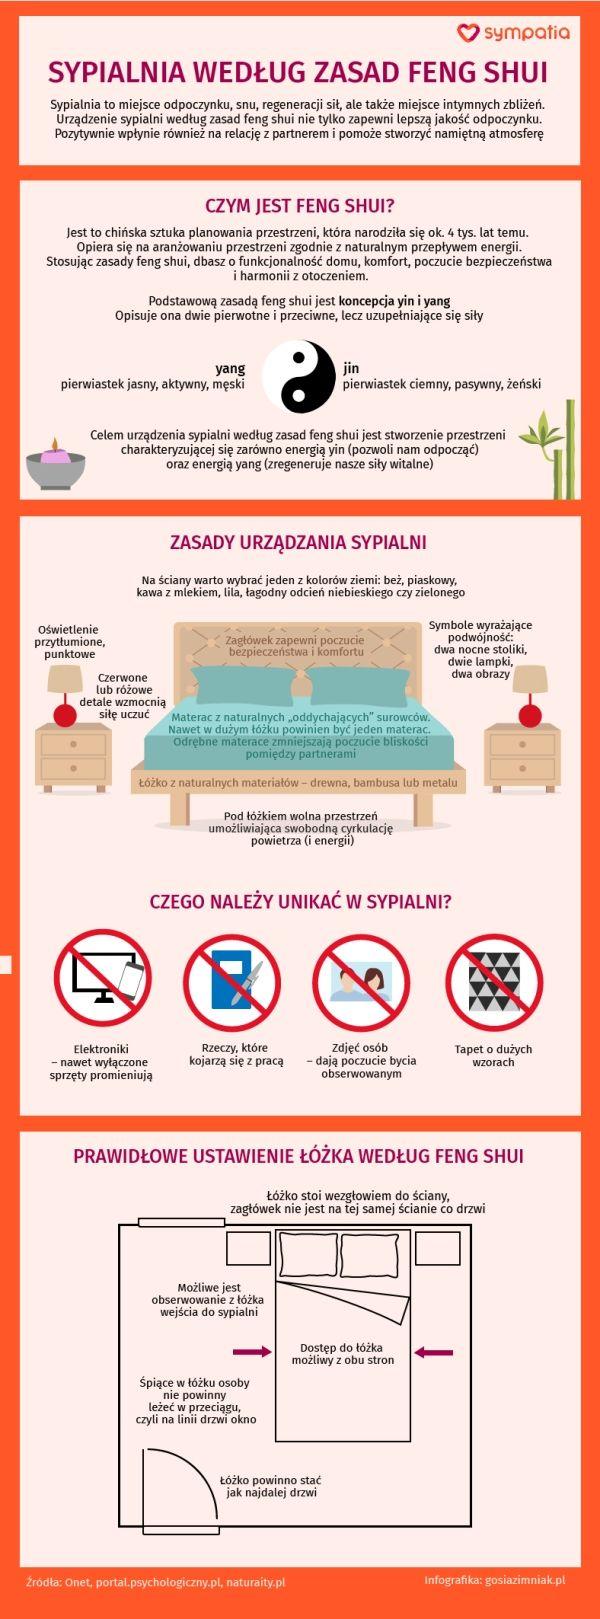 #fengshui #bedroom #sypialnia#infografika #infographic